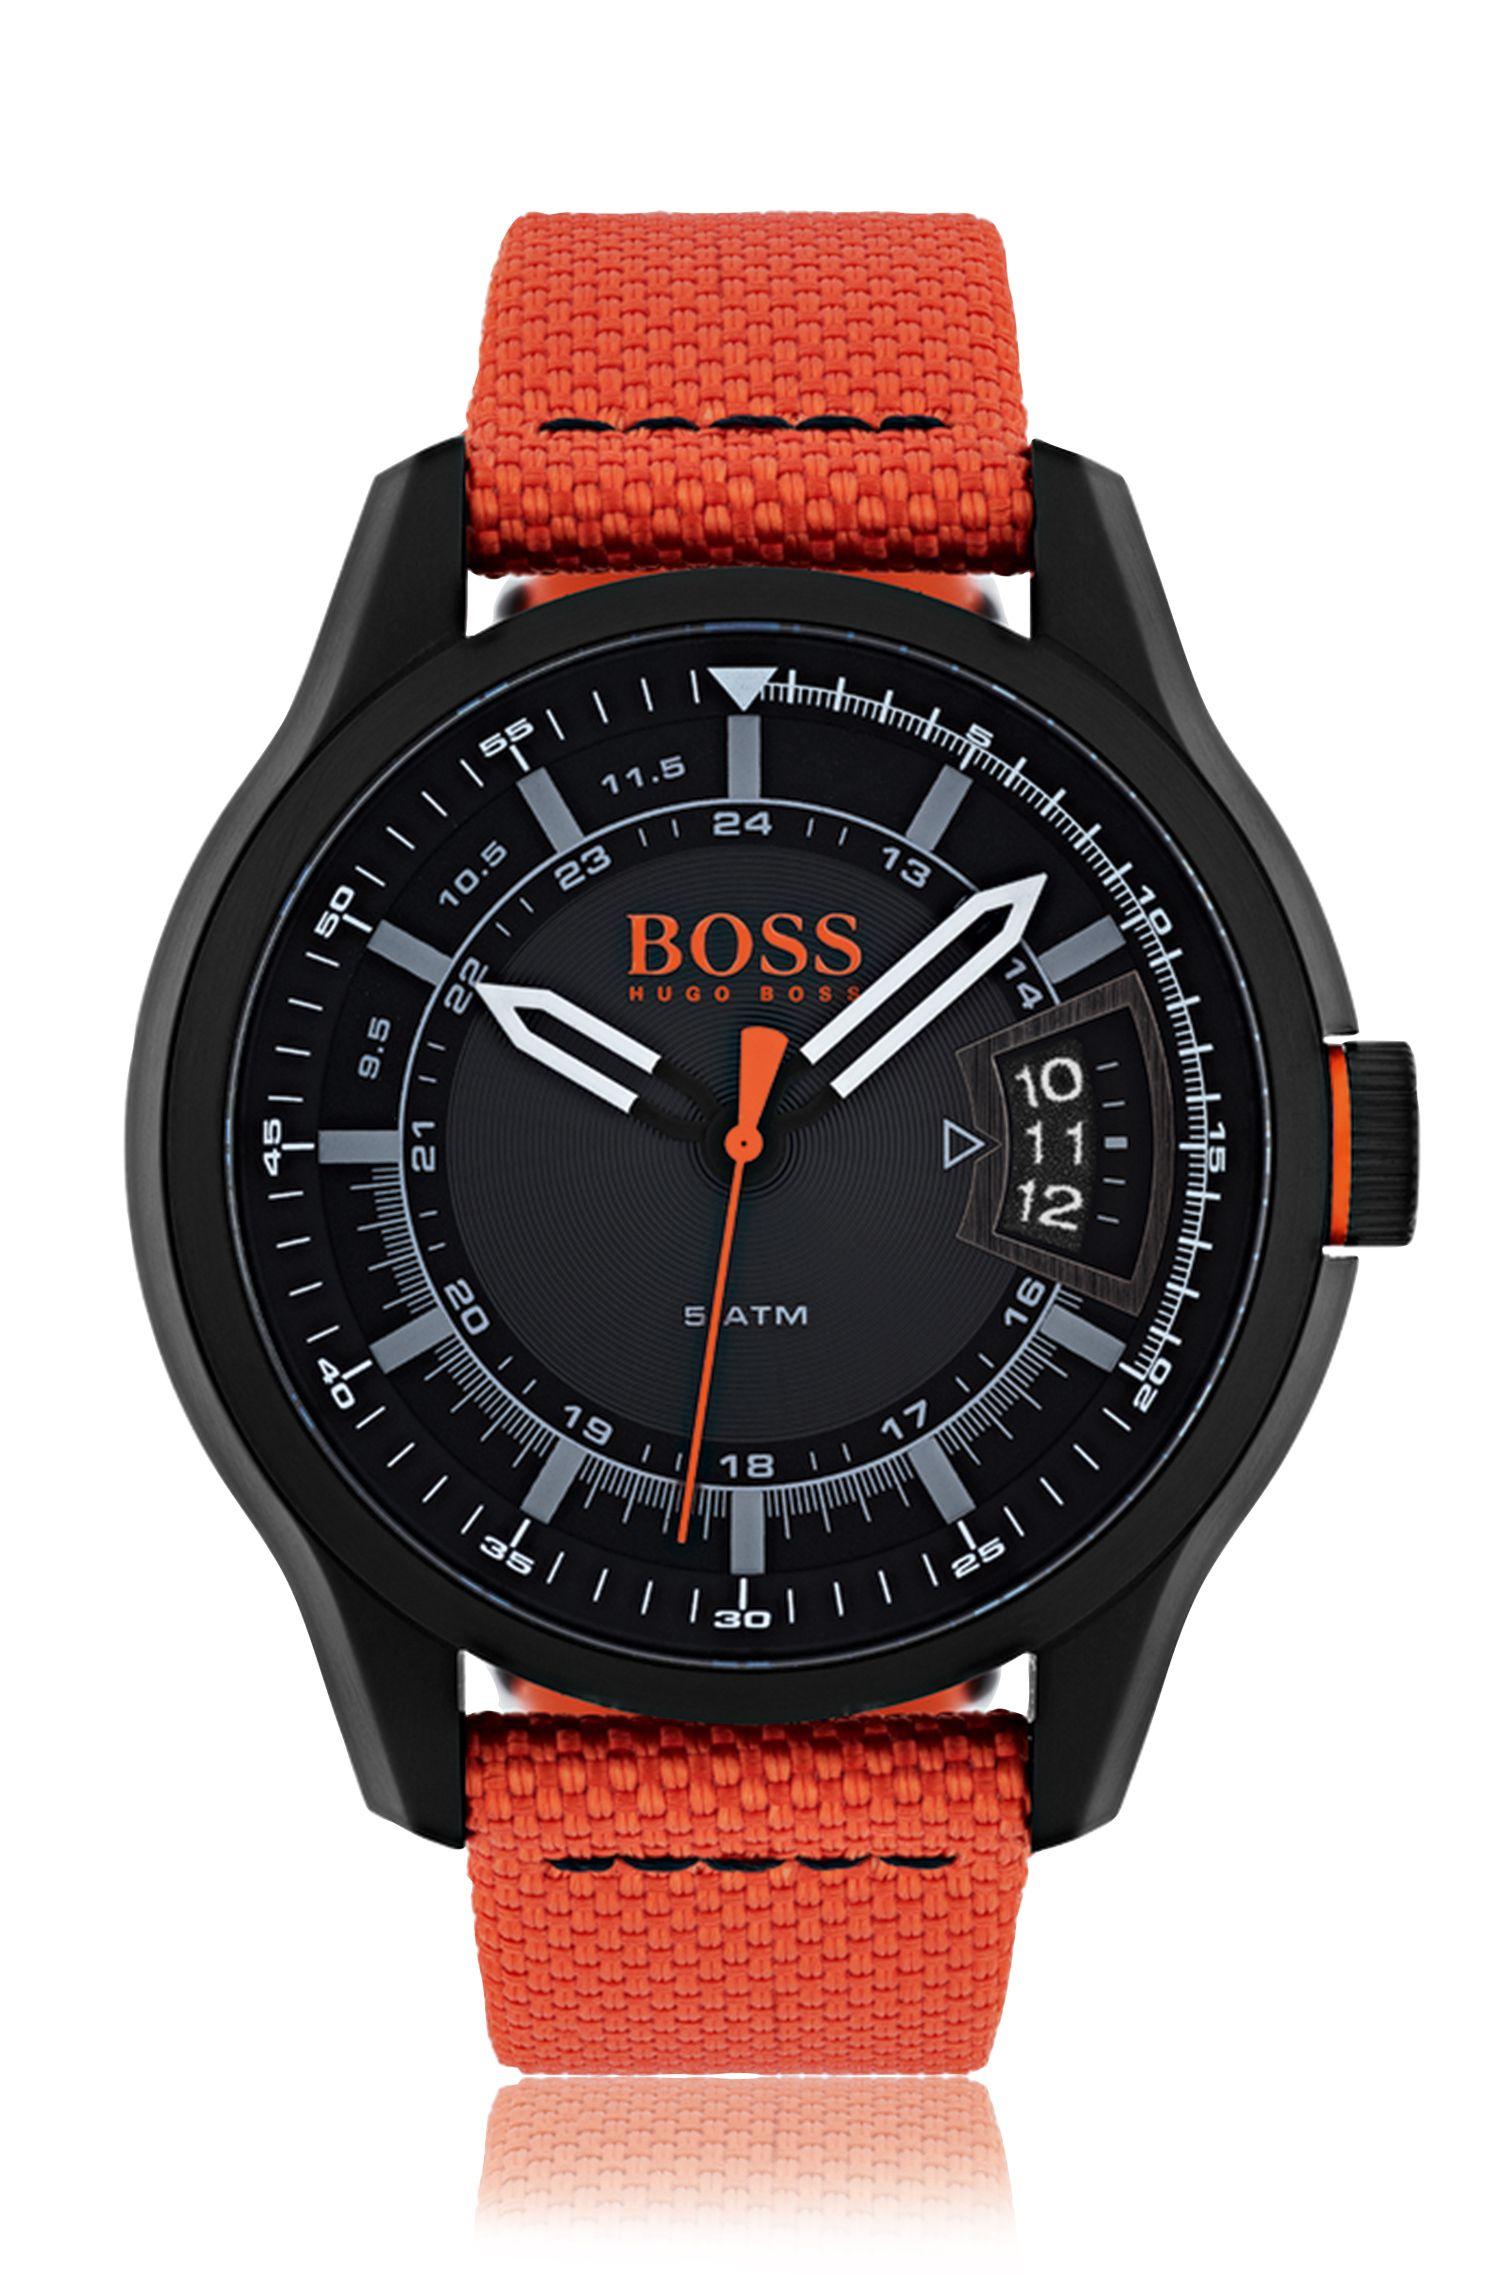 Blackened stainless-steel three-hand watch with orange fabric strap